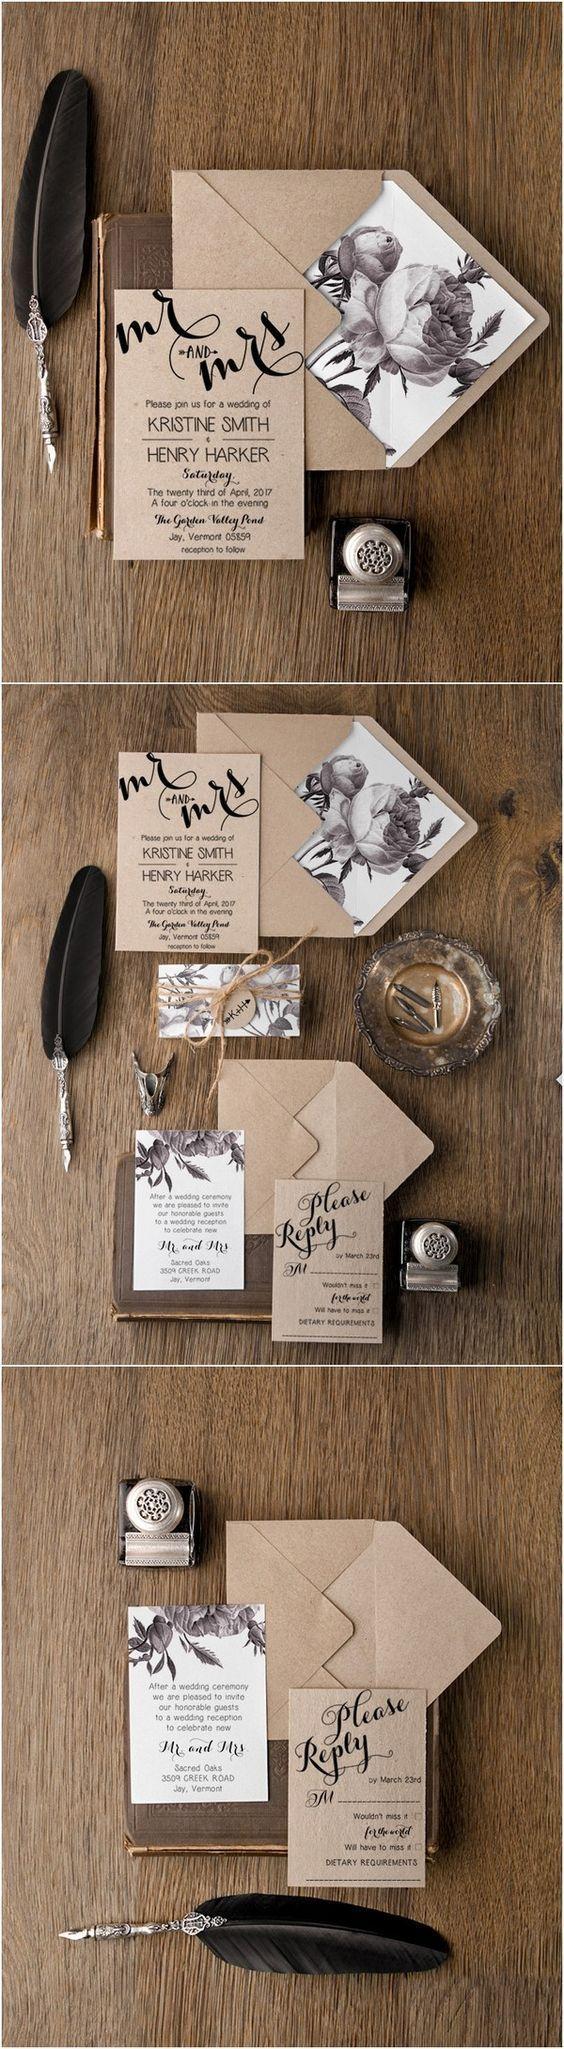 deer hunter wedding invitations%0A Rustic simple wedding invitations